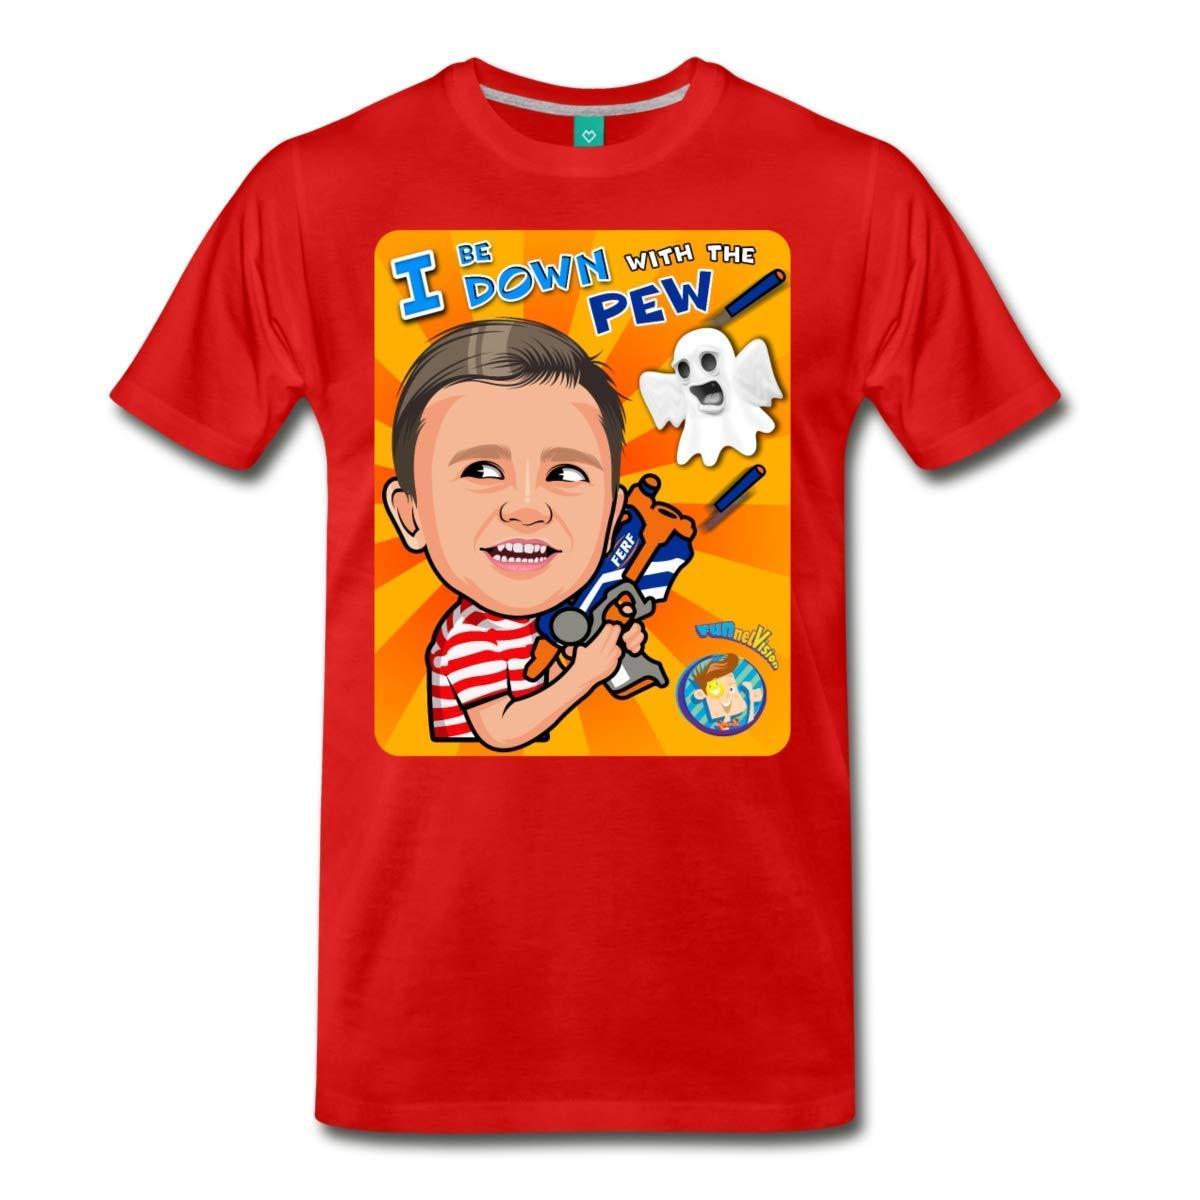 67b568cb1 Anzhouqu Funnel Vision Down with The Pew Men's Premium T-Shirt Plus Size  Black   Amazon.com